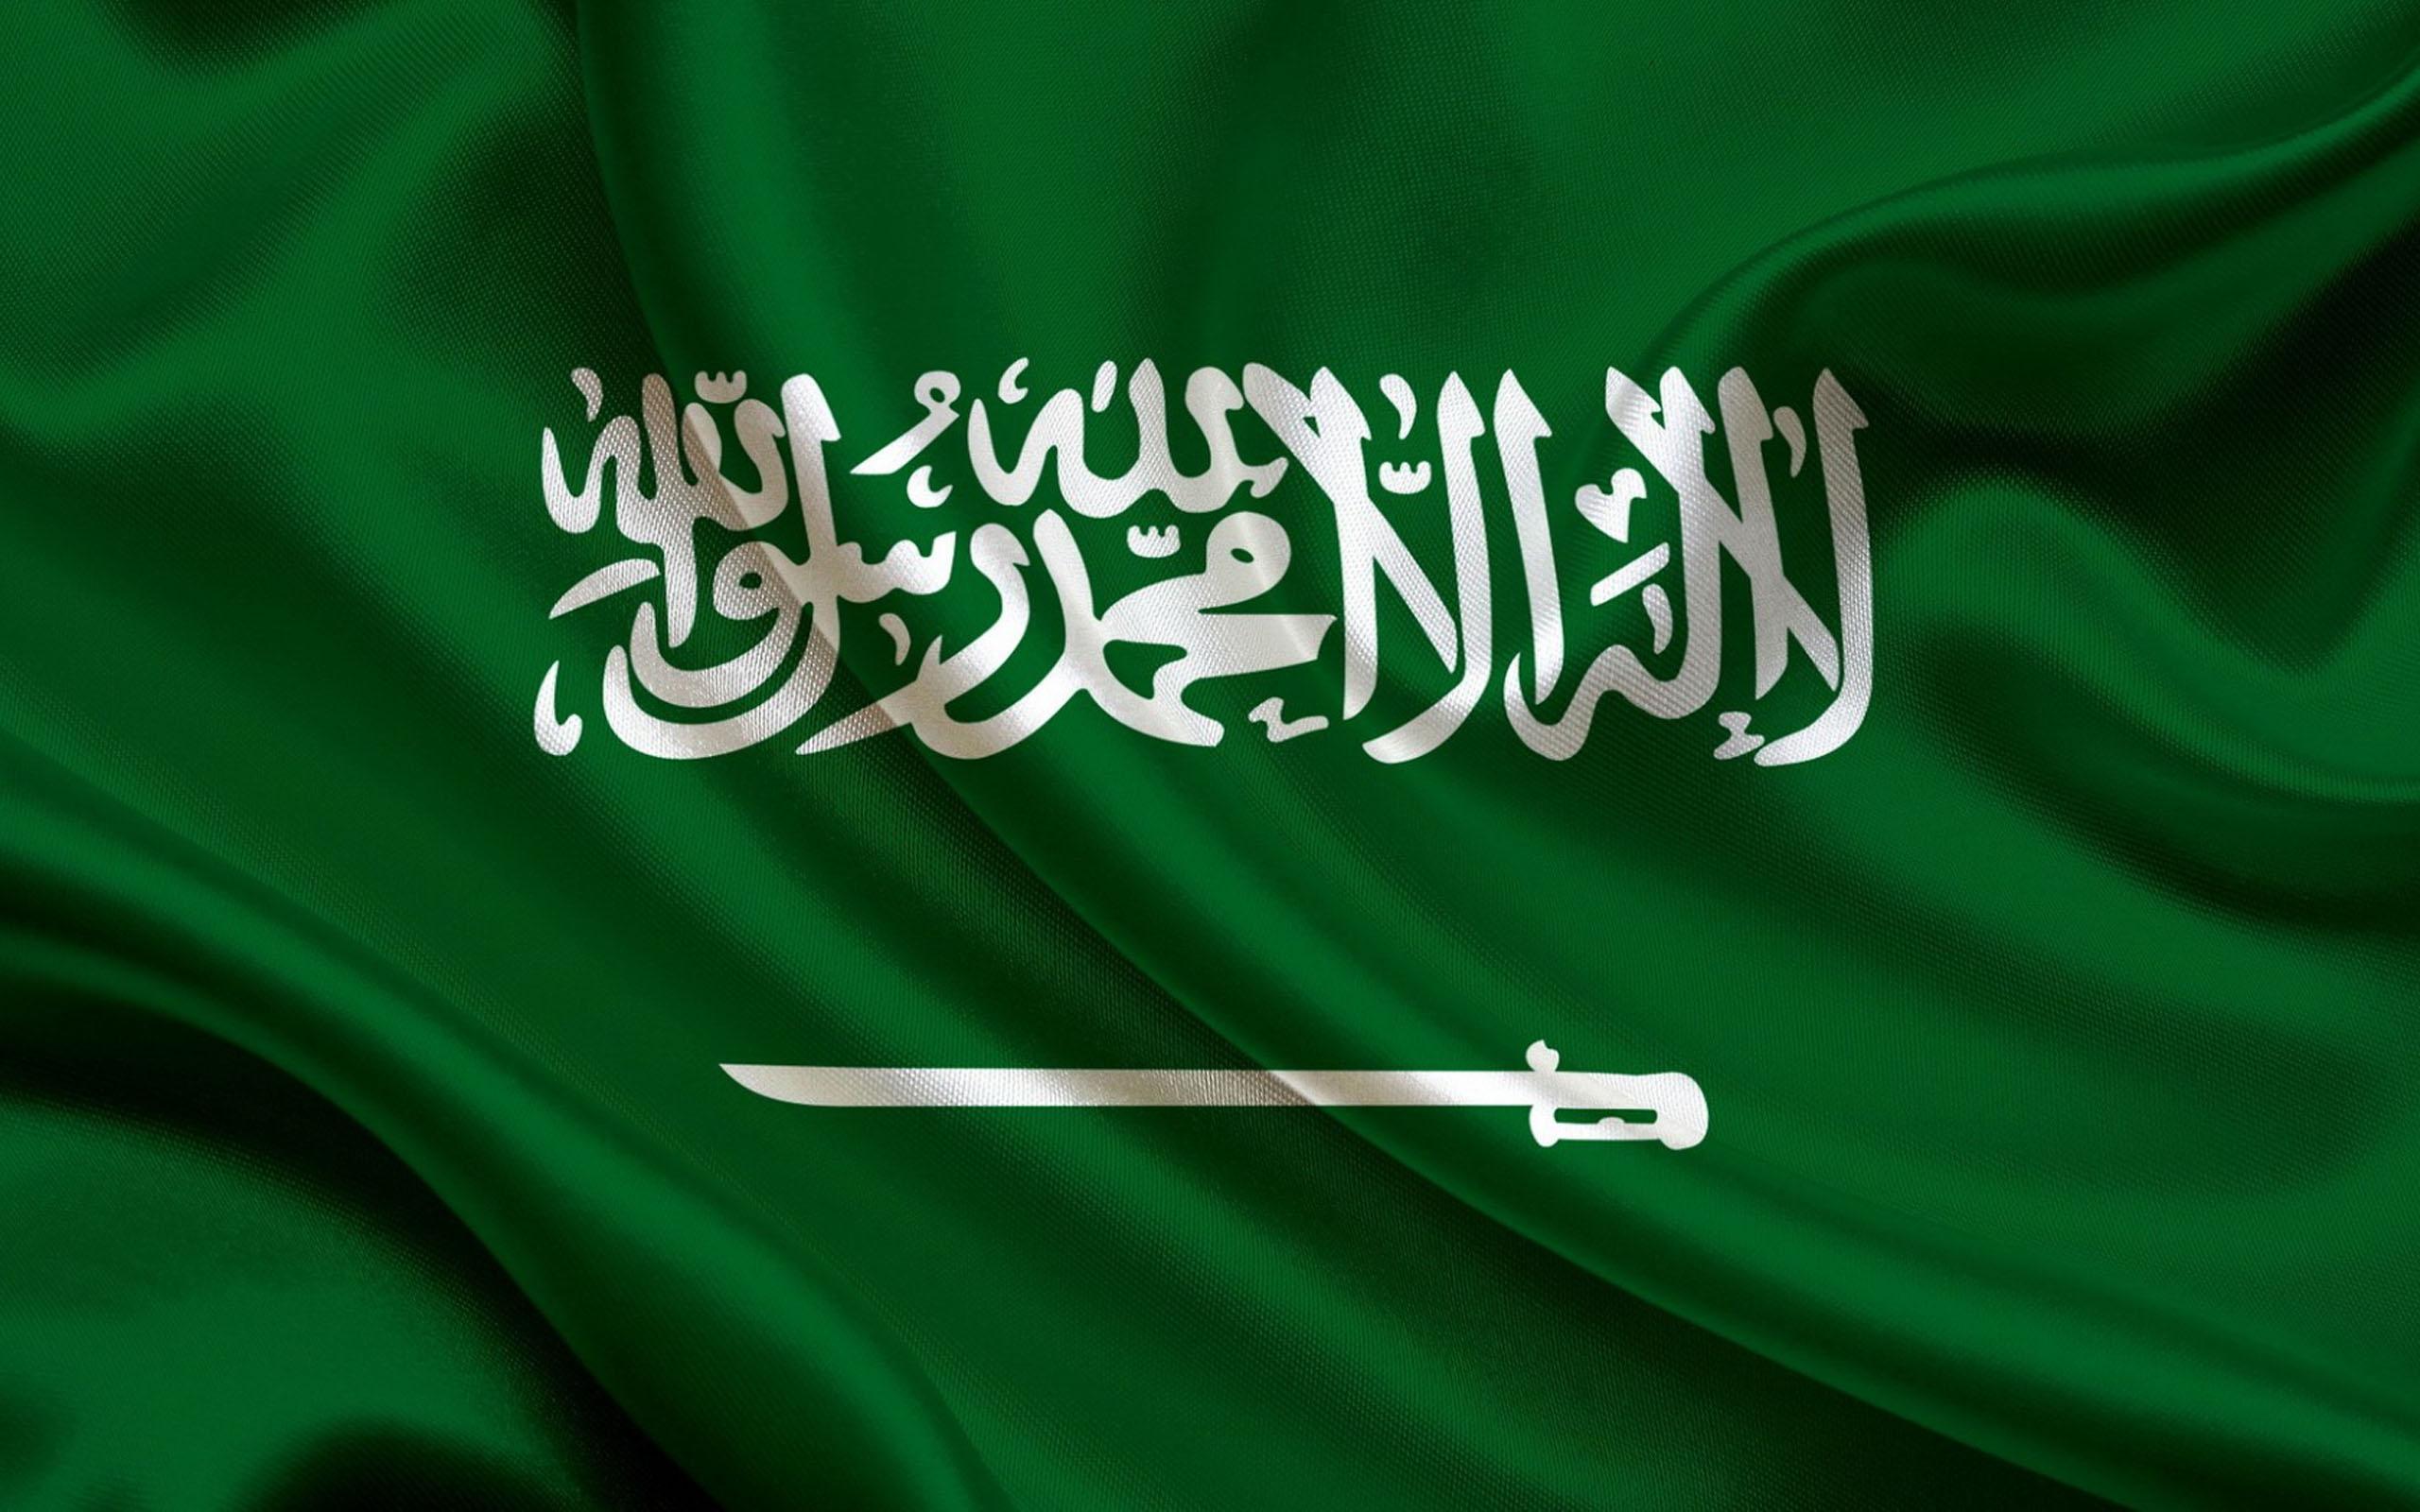 Amazing Flag Of Saudi Arabia Pictures & Backgrounds